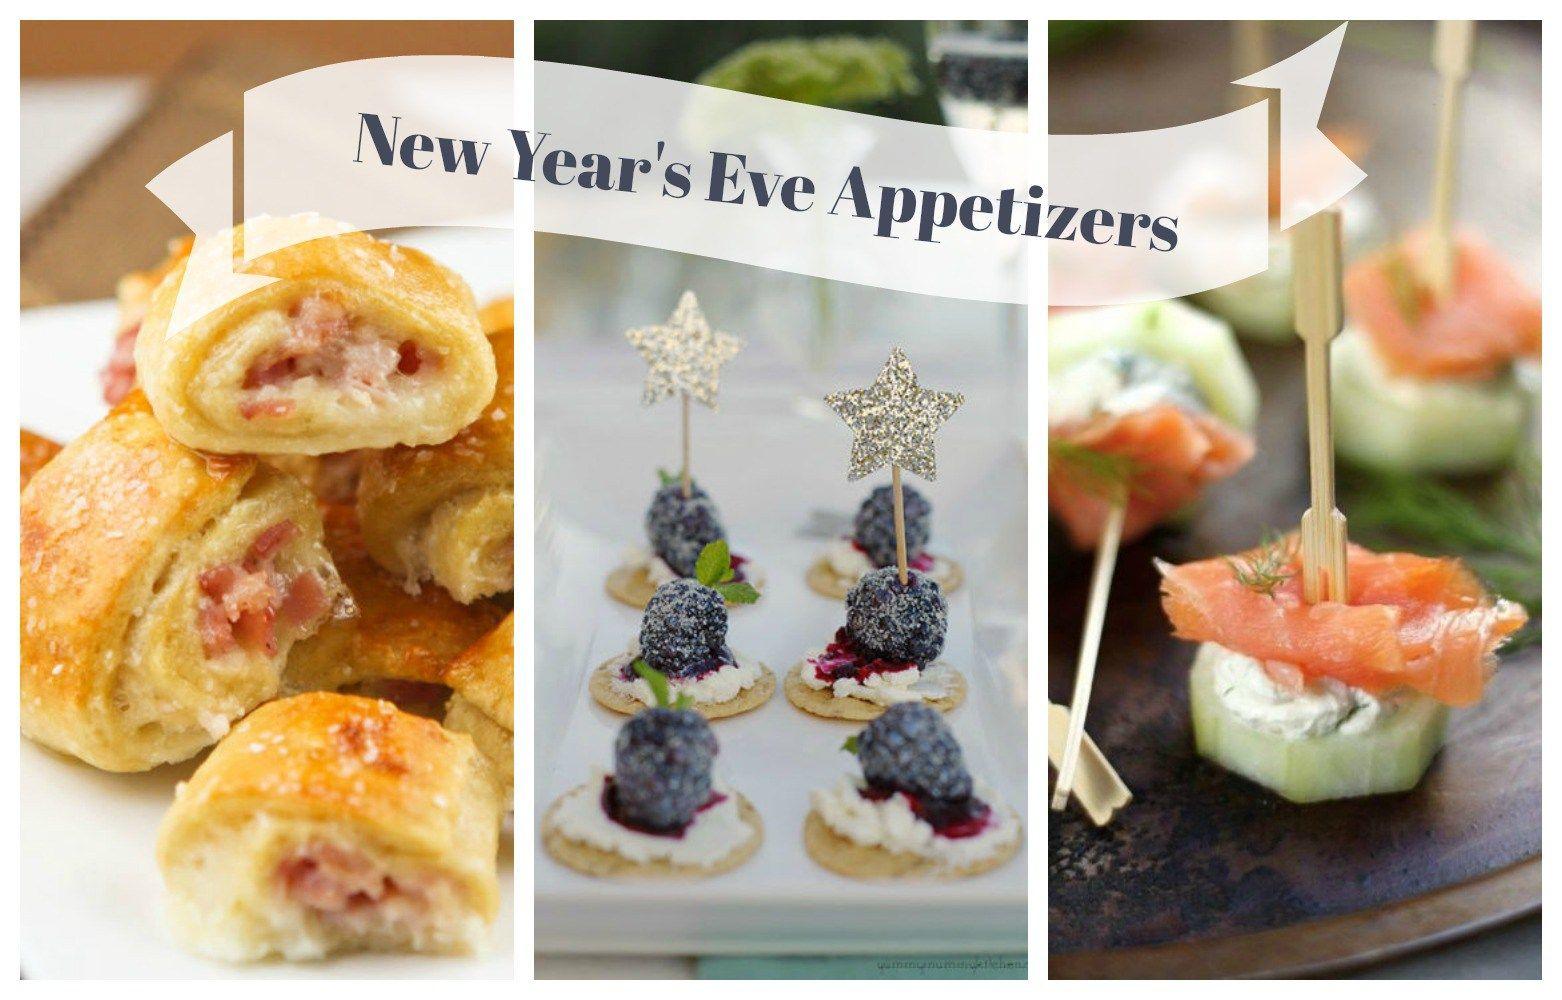 New Year's Eve Appetizers New year's eve appetizers